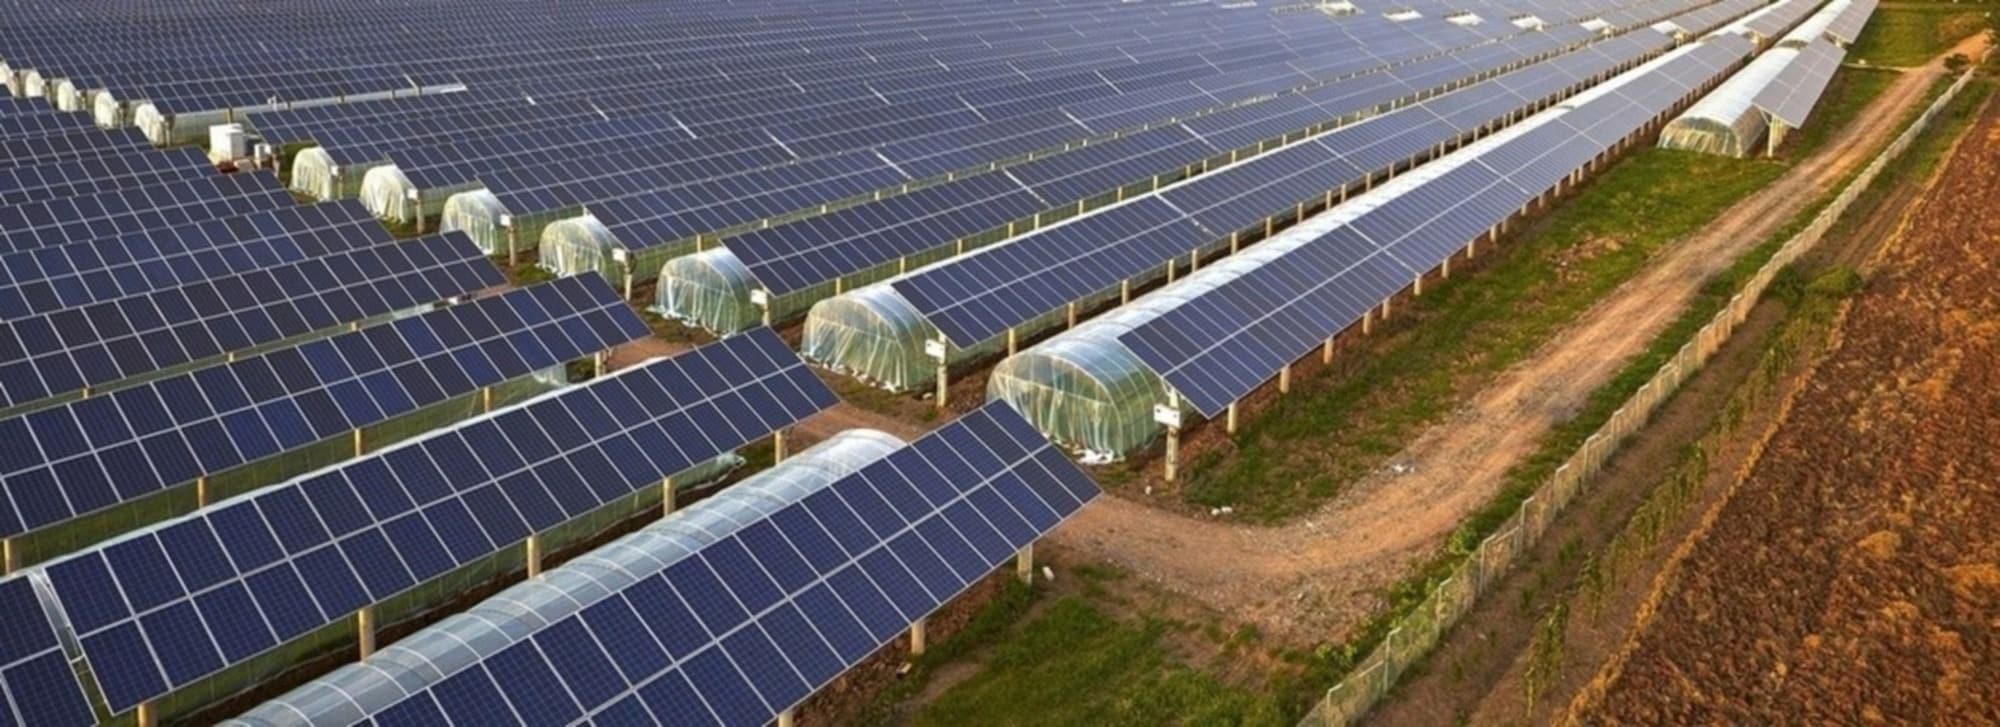 Commercial-Solar-Modules